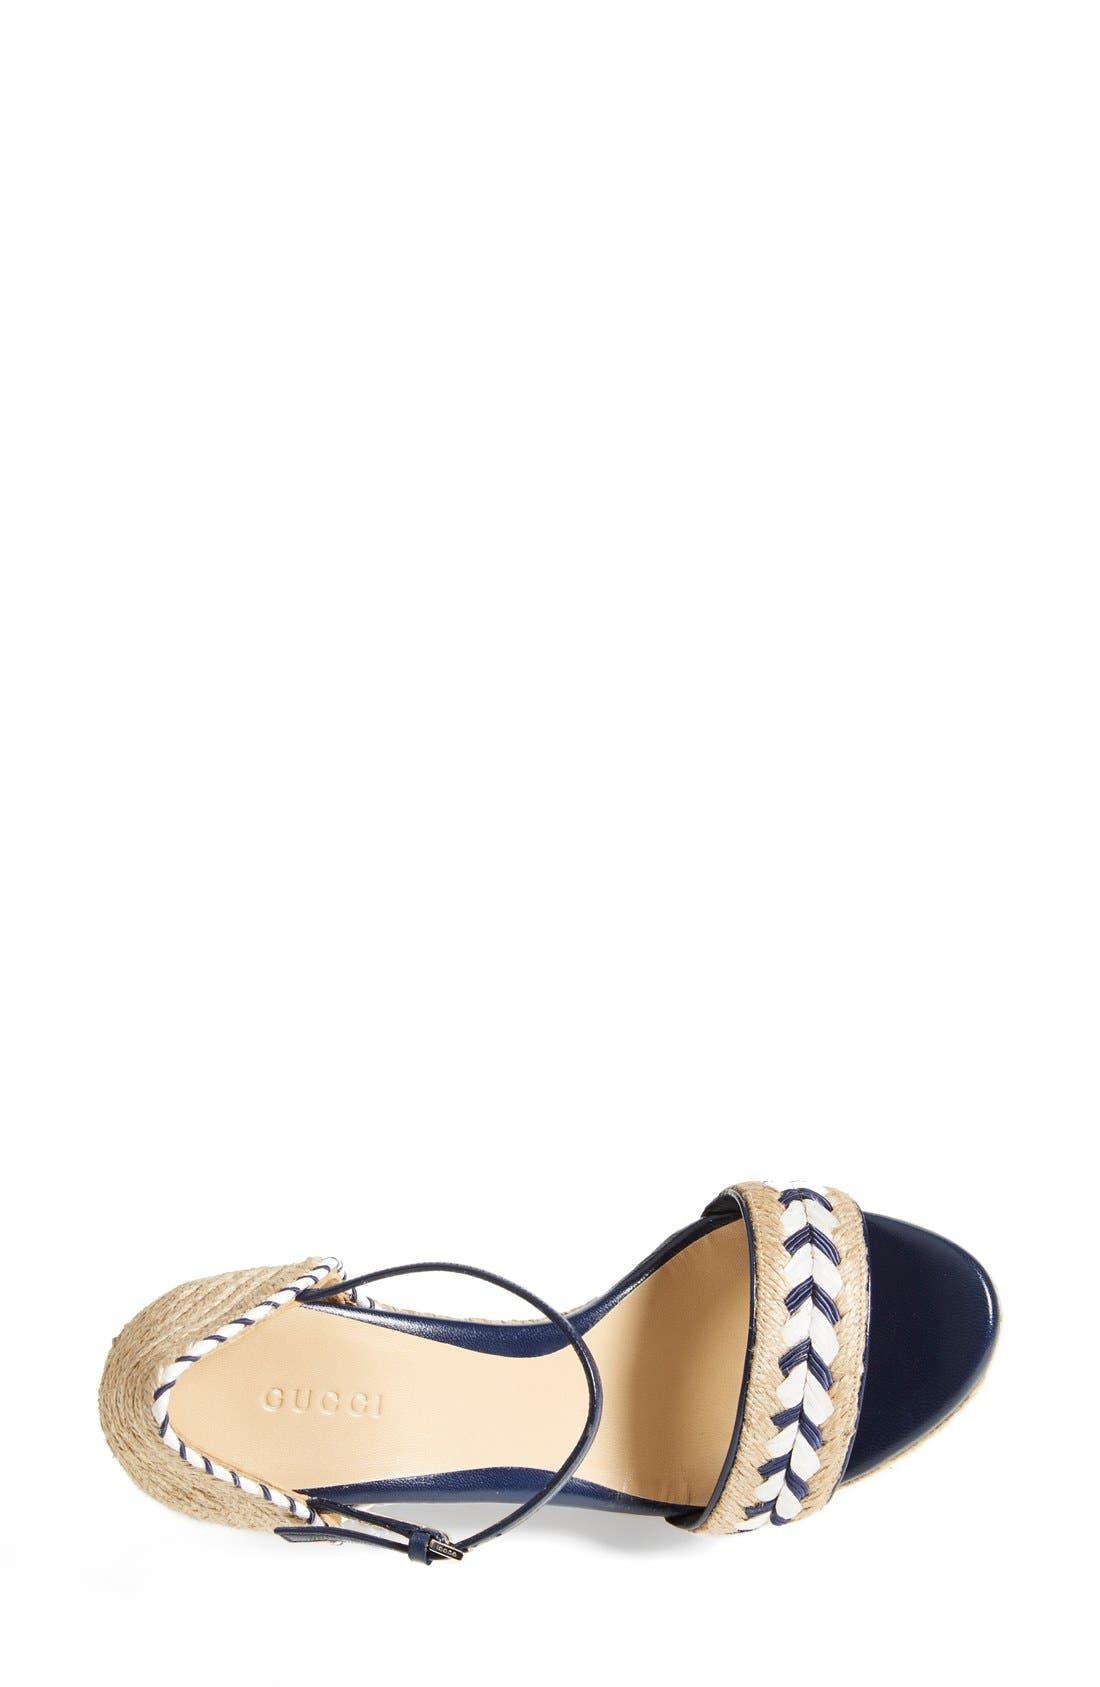 Alternate Image 3  - Gucci 'Tiffany' Wedge Sandal (Women)